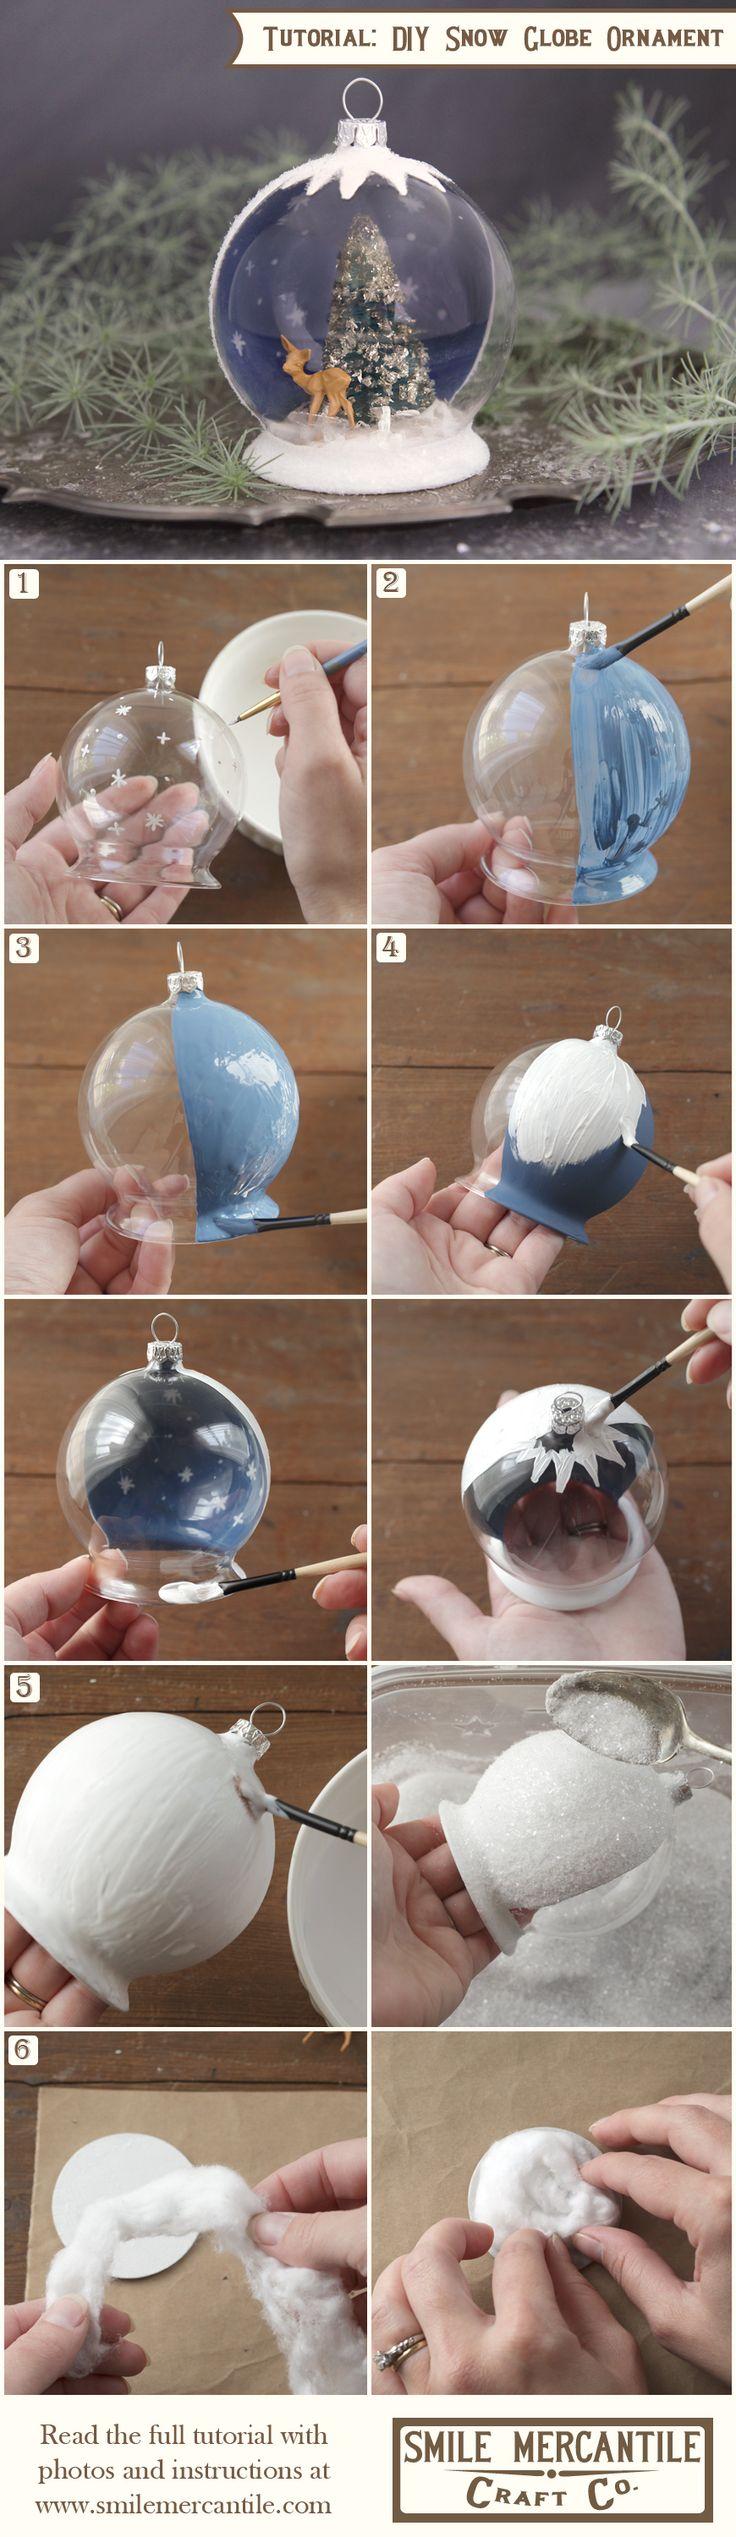 Tutorial: Christmas Snow Globe Ornament                                                                                                                                                      More